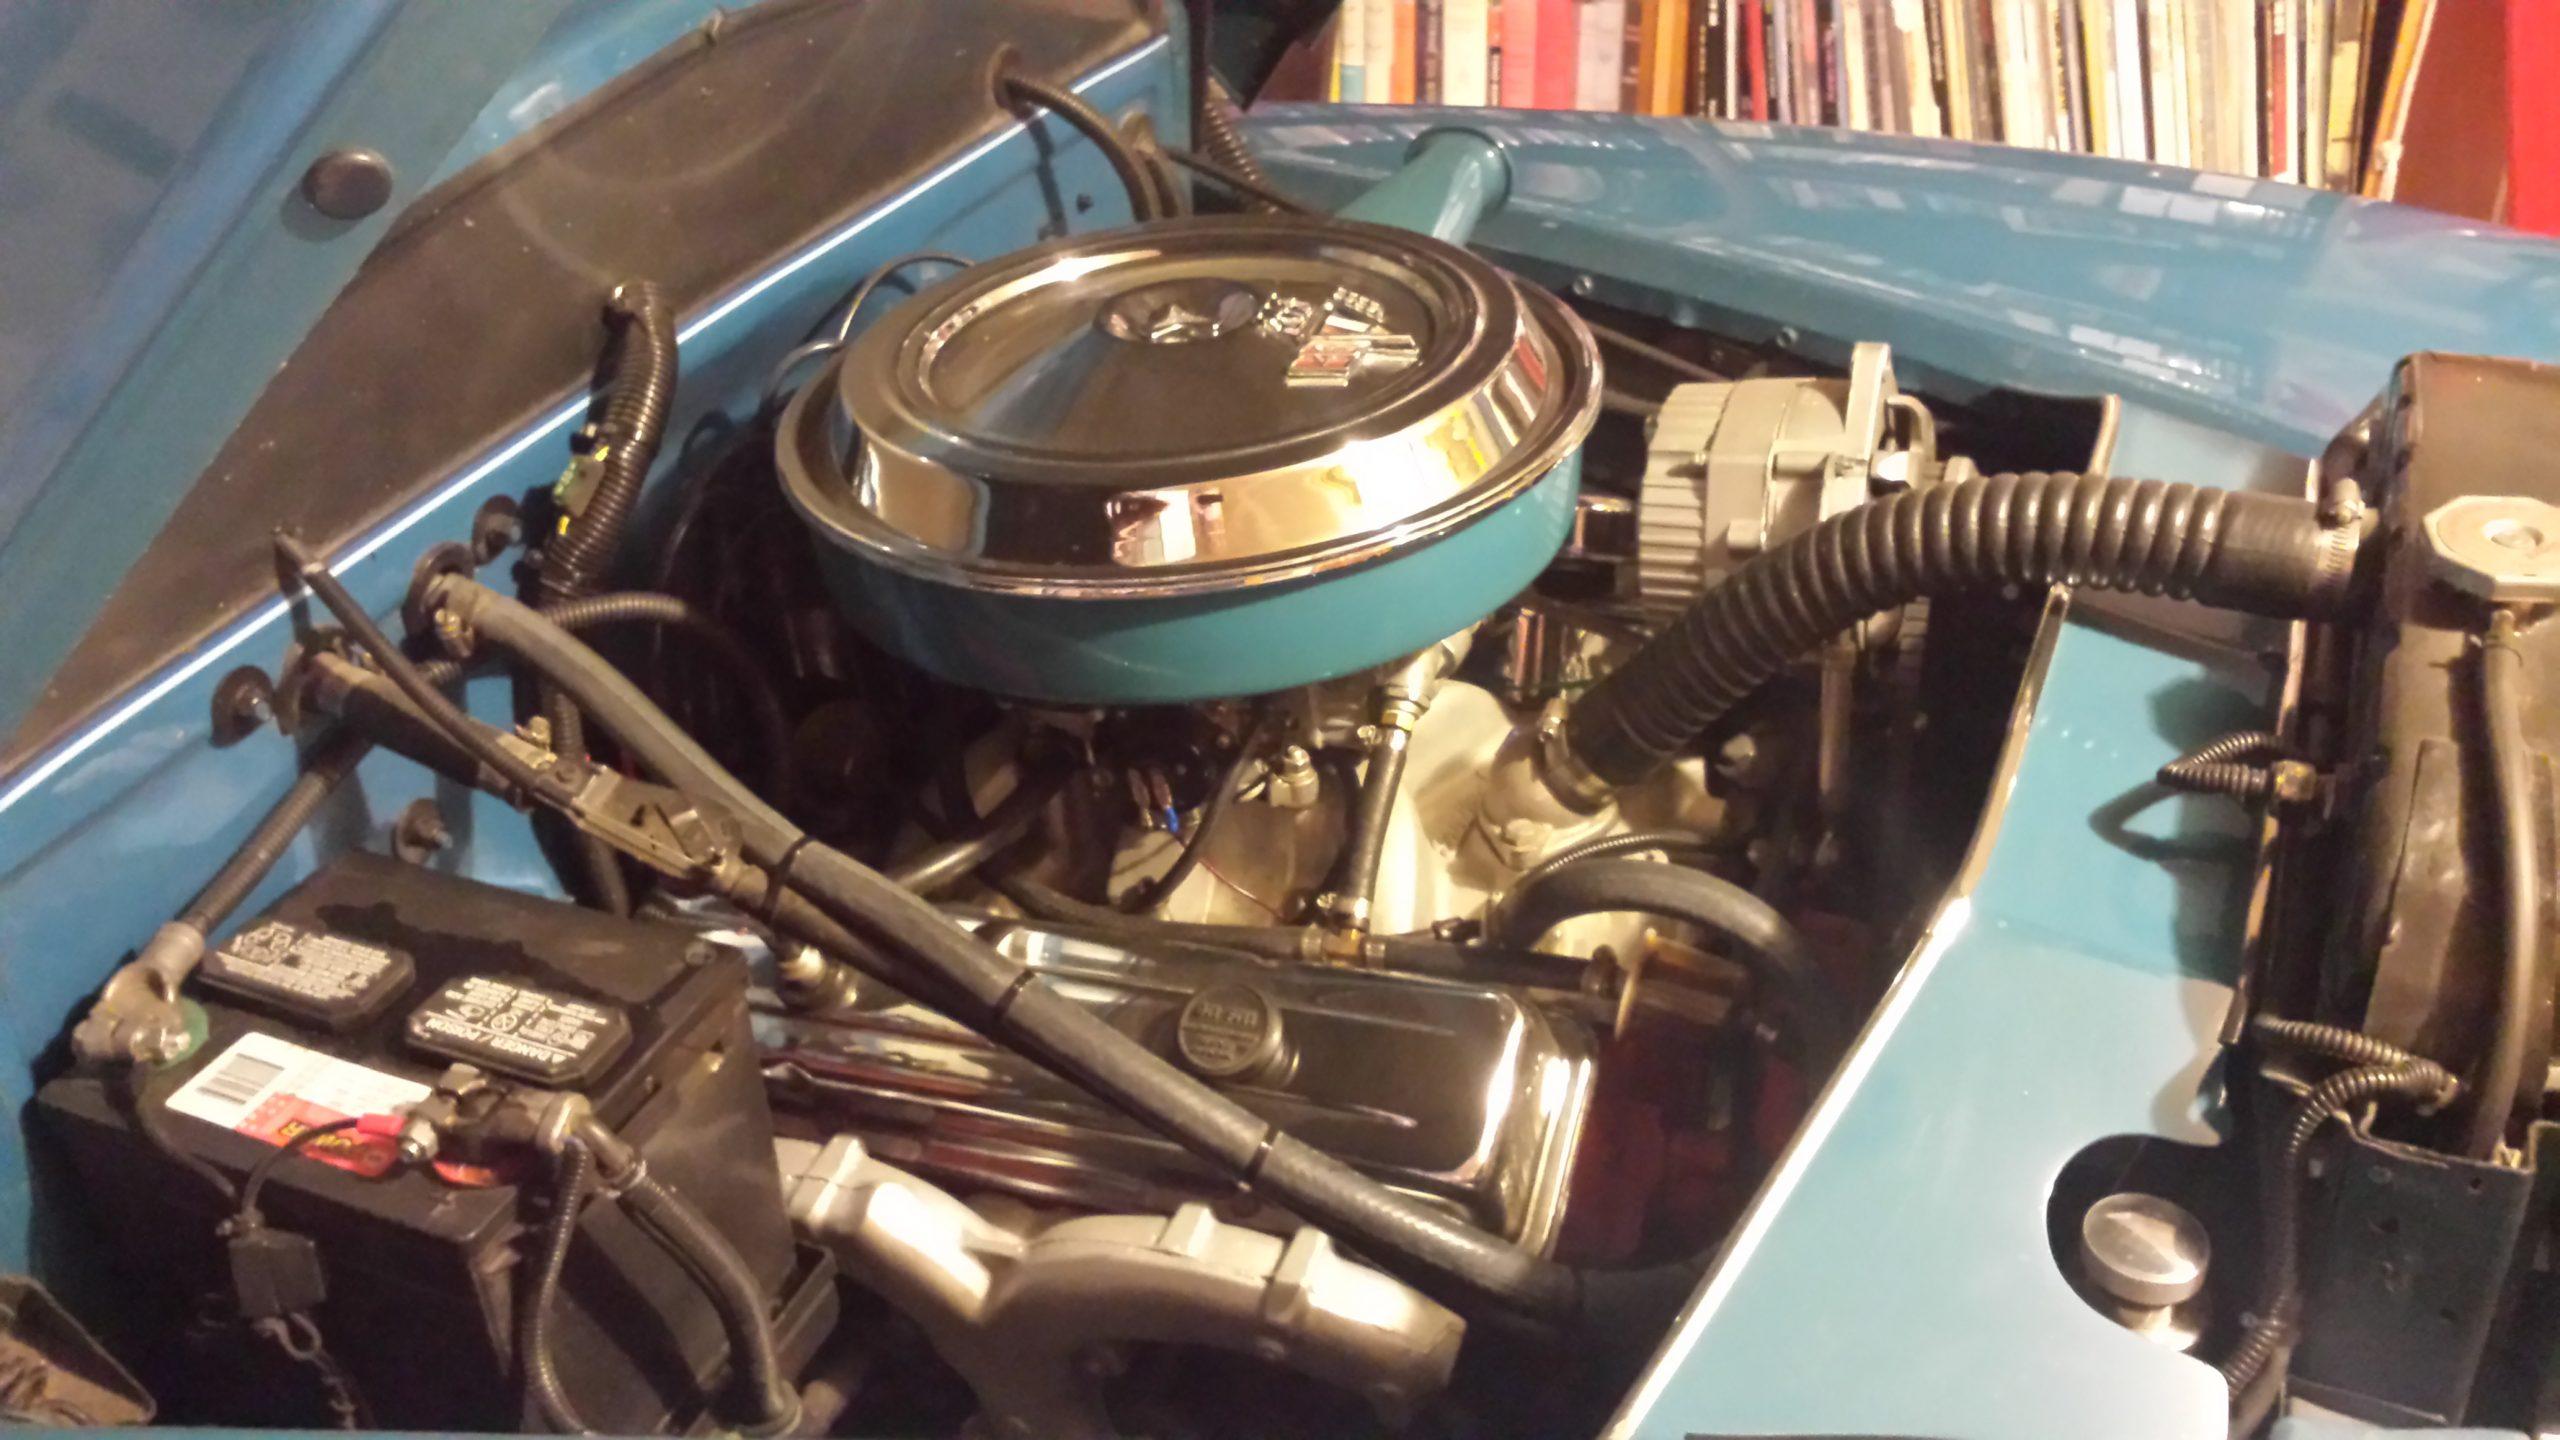 1948 Chevrolet Fleetmaster engine